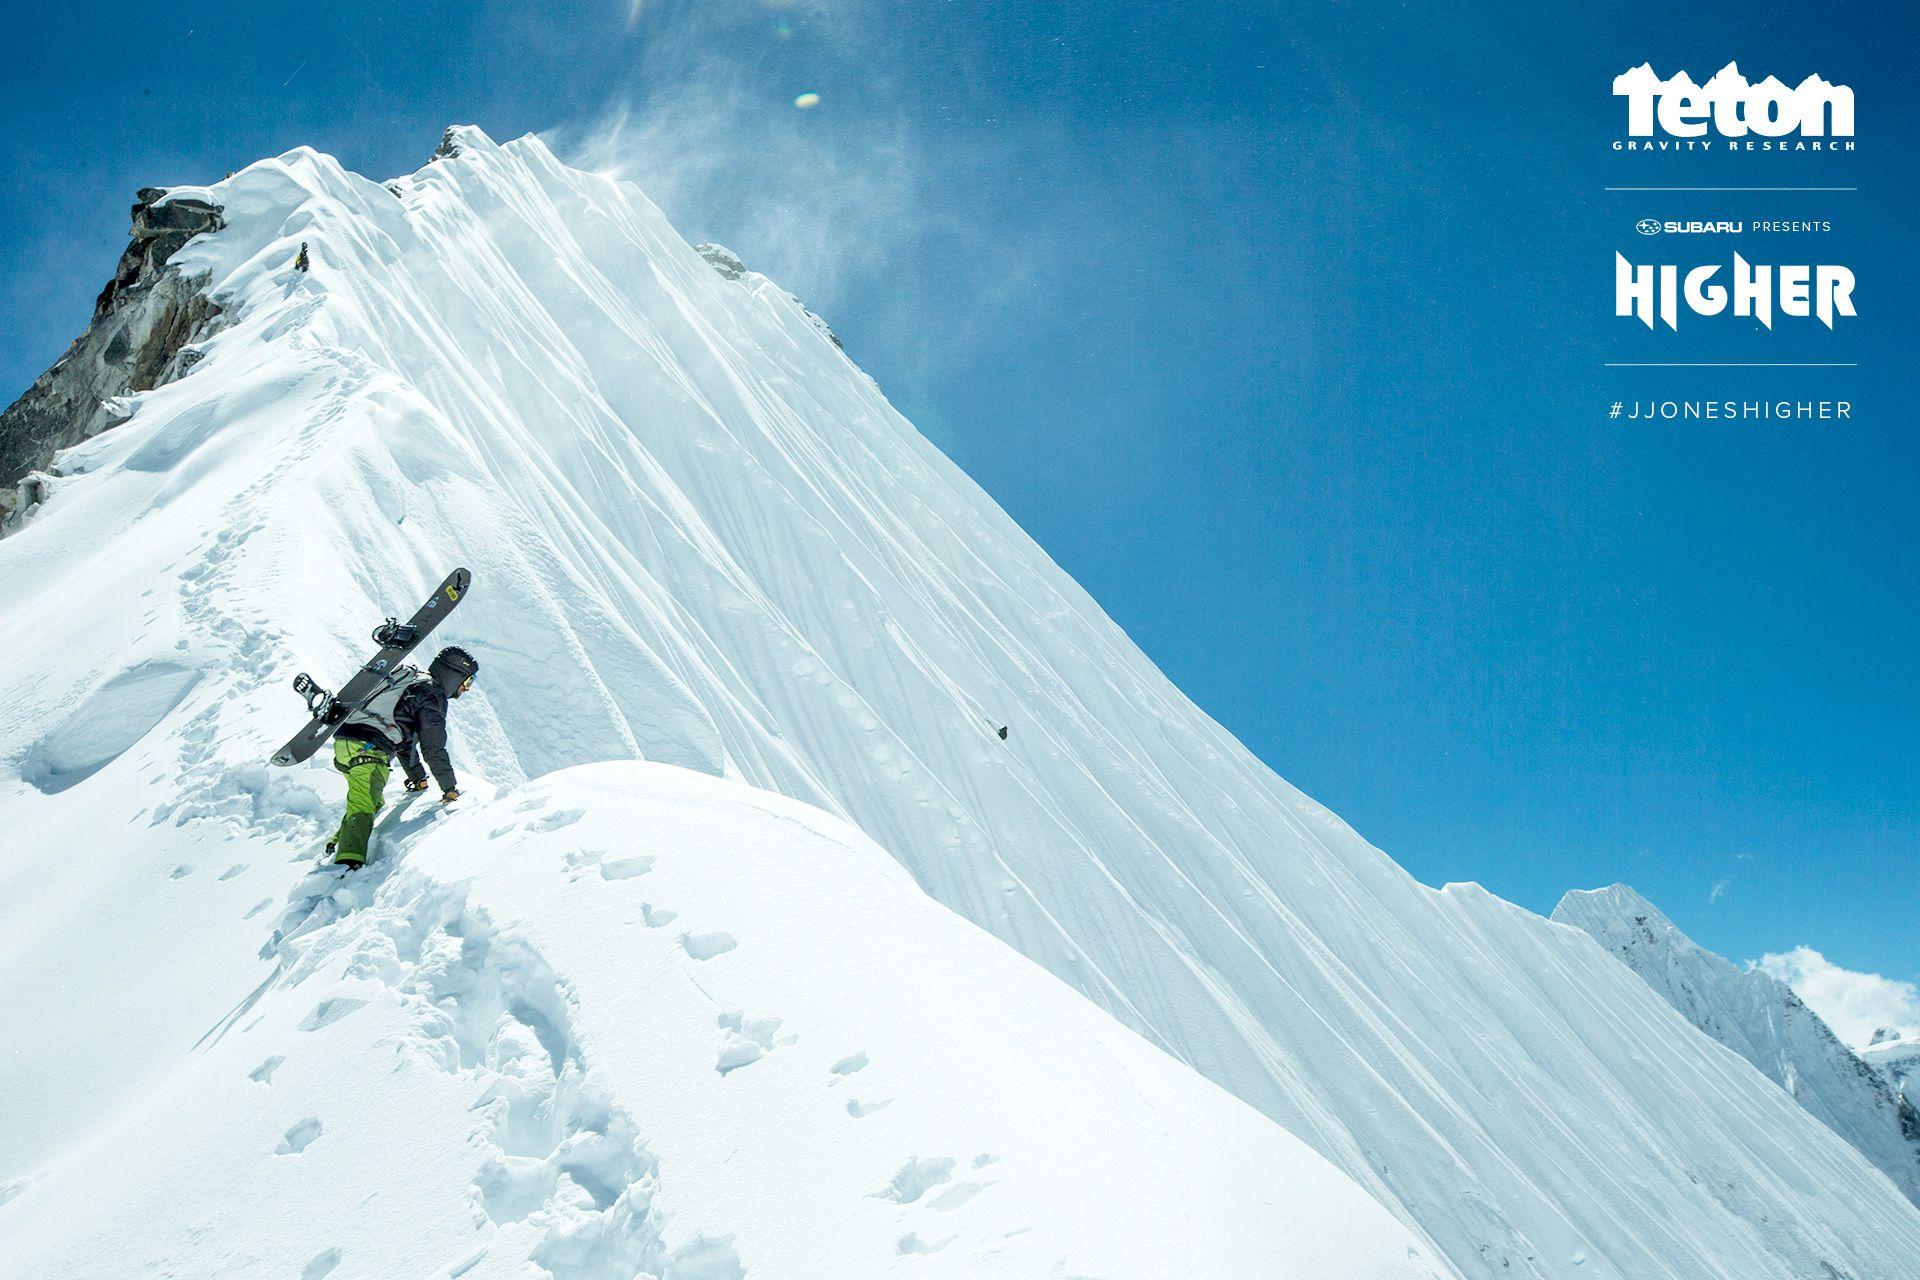 Pin By Marlene Goulet On Jeremy Jones Snowboarding